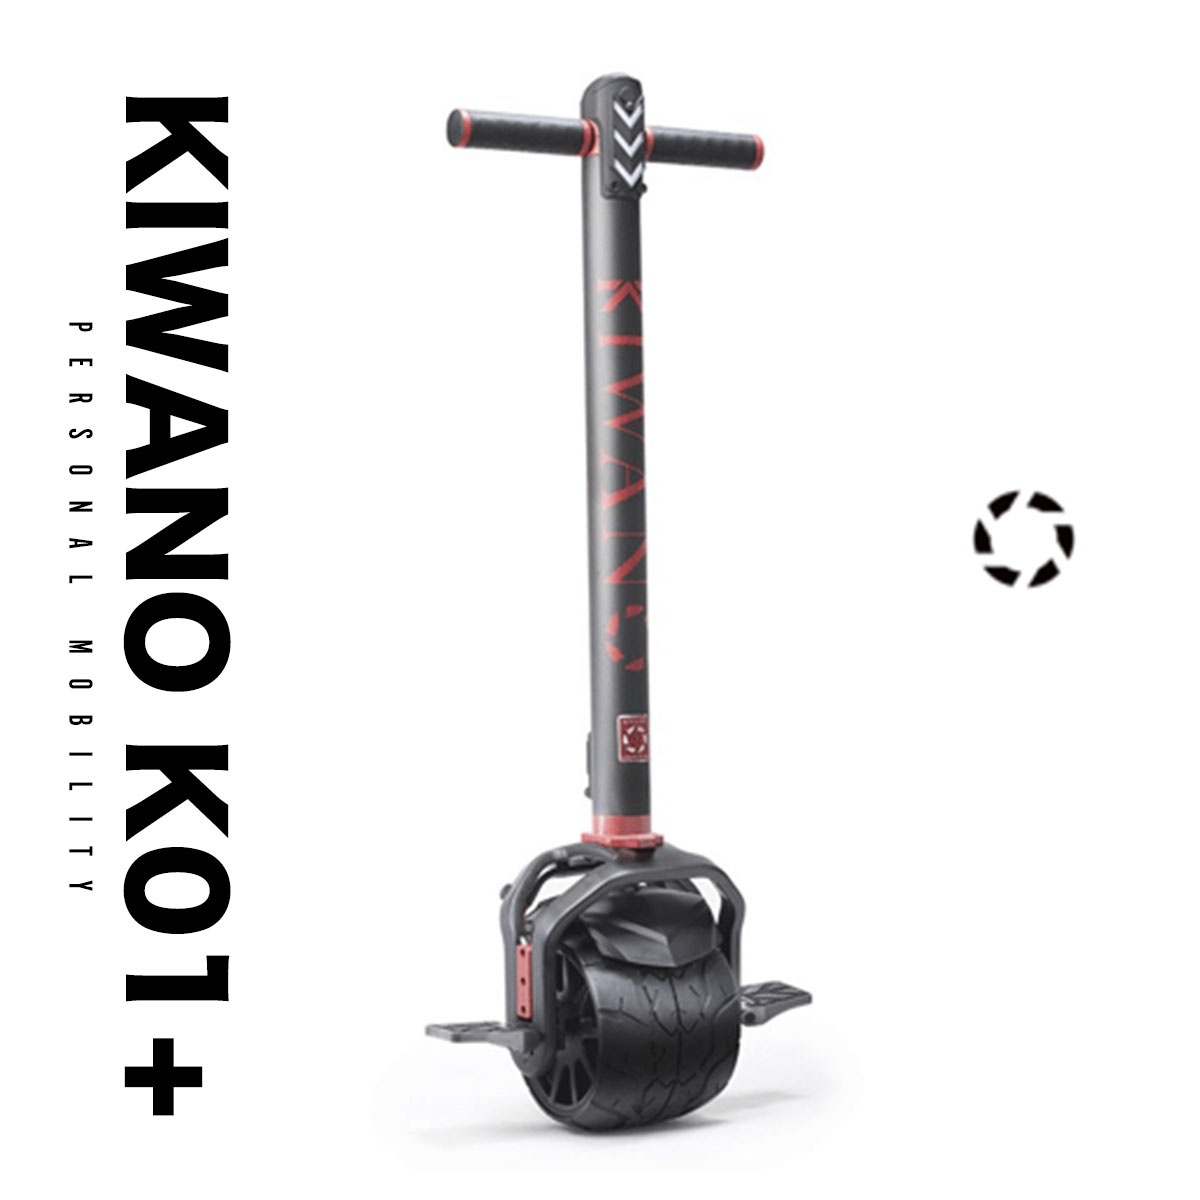 kiwano K01 立ち乗り式一輪車 電動スクーター 乗り物 おもちゃ スクーター バランス歩行機 アシスト歩行 バランスホイール パーソナルモビリティ スマートロック 正規品